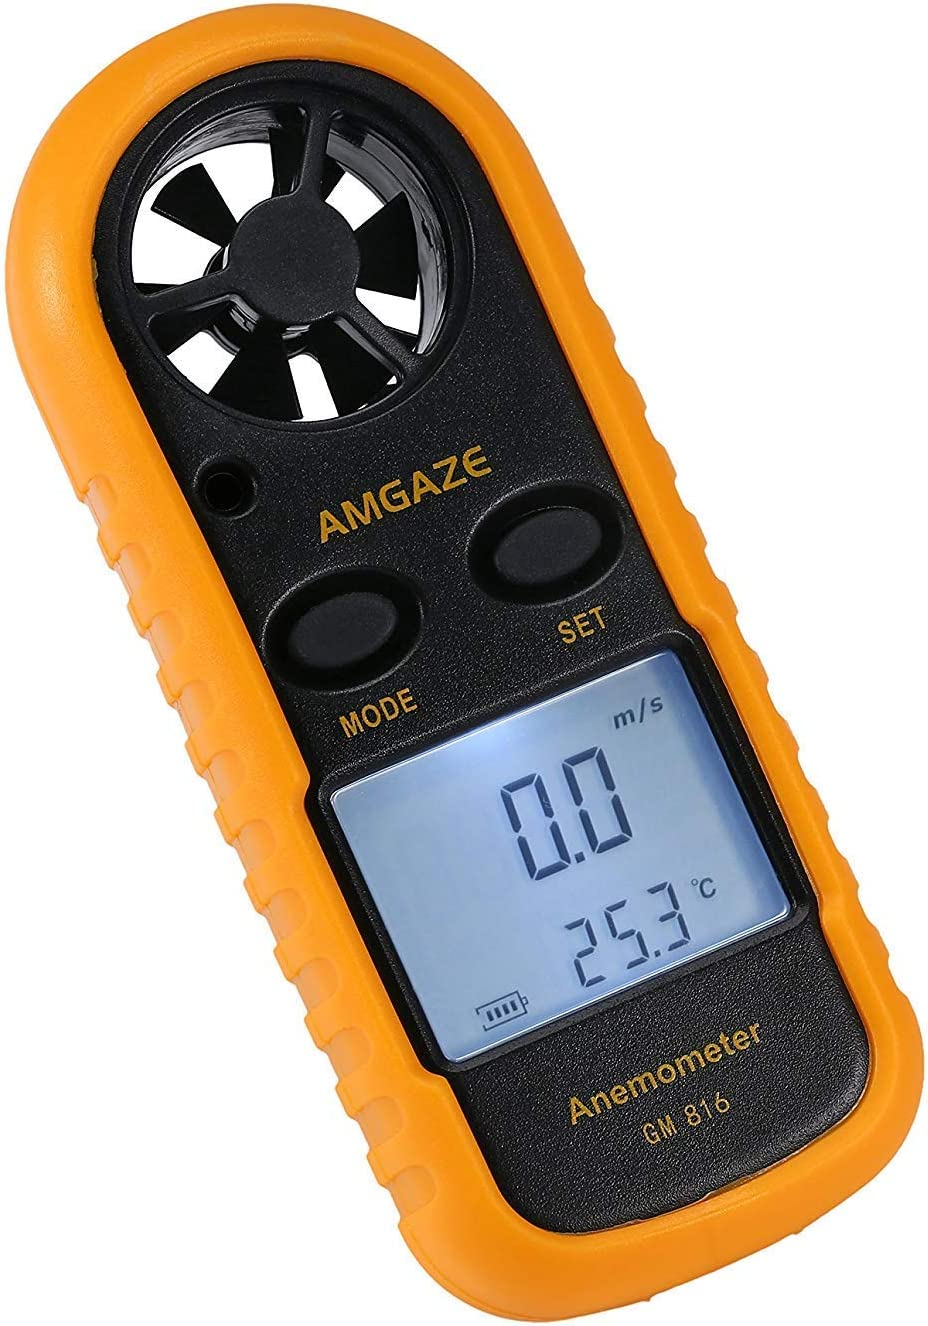 Mini LCD Wind Speed Gauge Air Geschwindigkeit Meter Anemometer NTC Thermomete